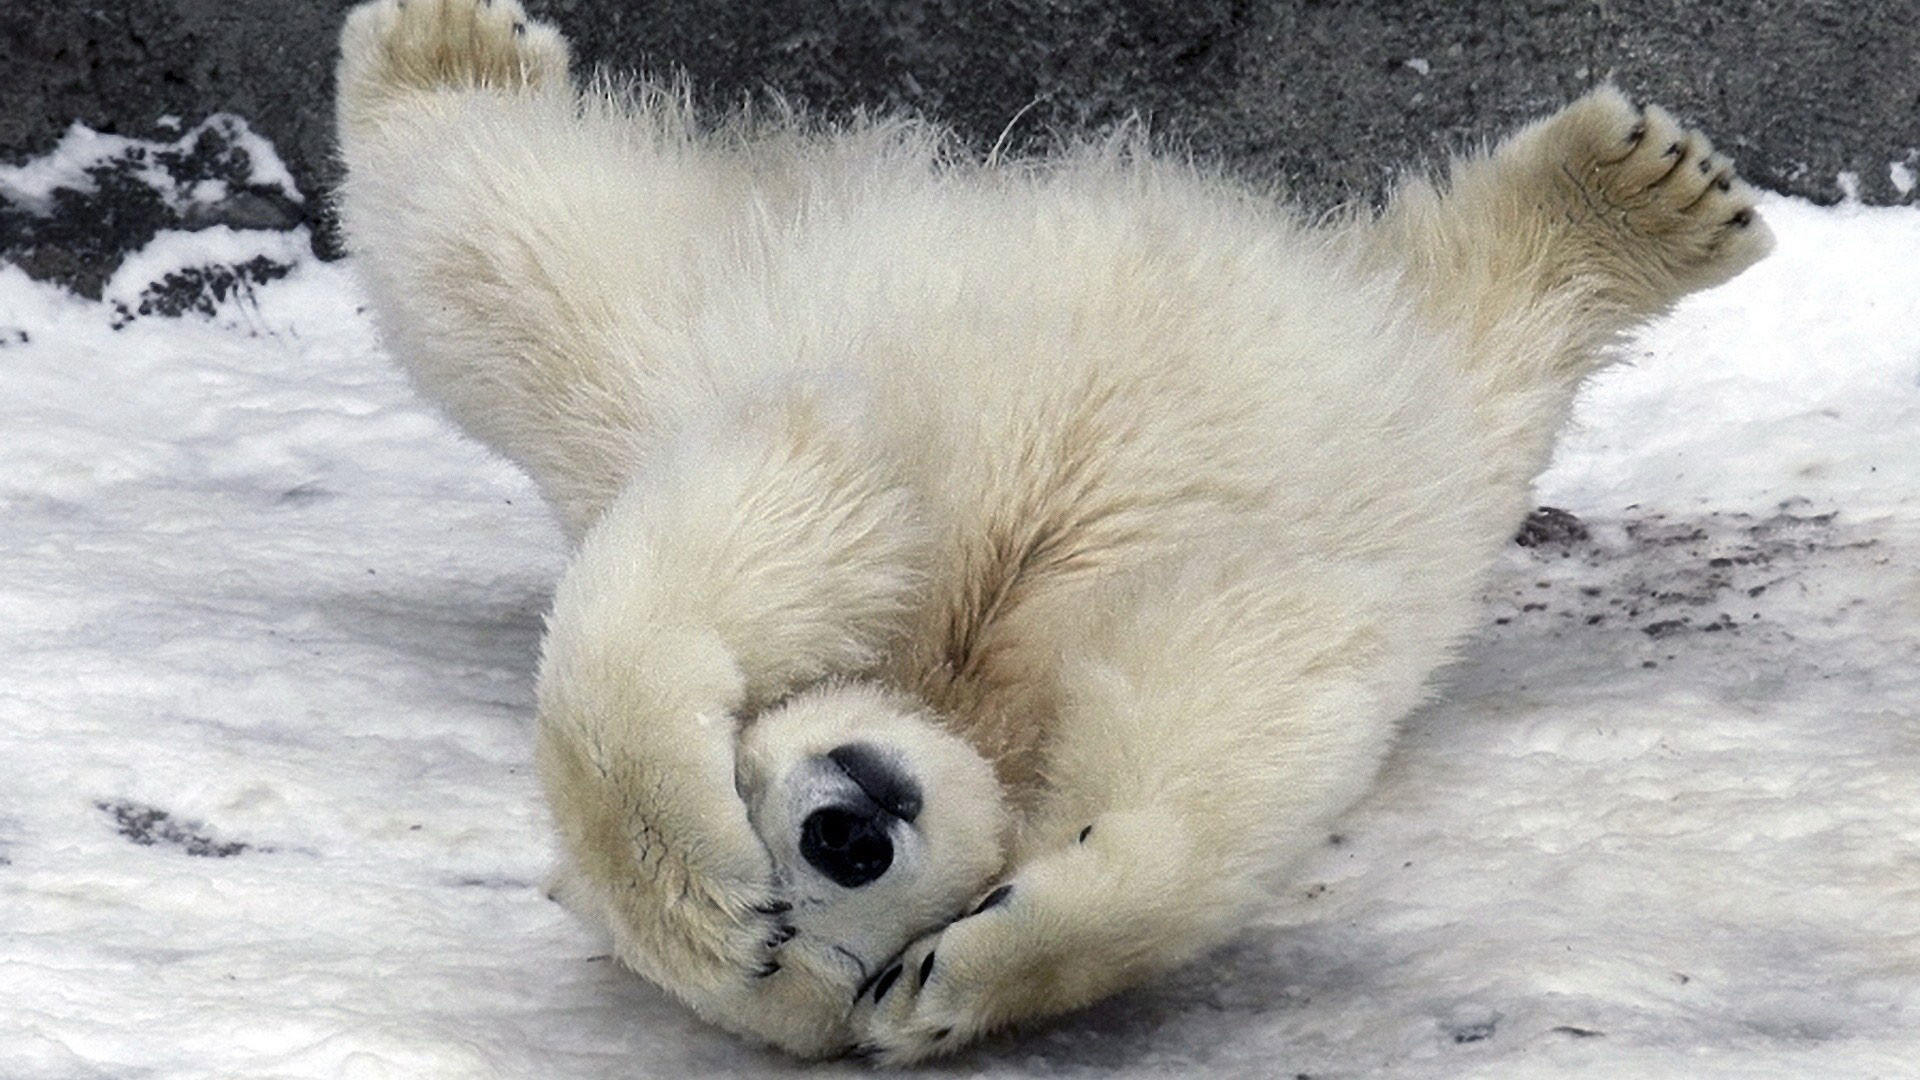 hd pics photos best funny animals polar bear snow ice winter hd quality  desktop background wallpaper